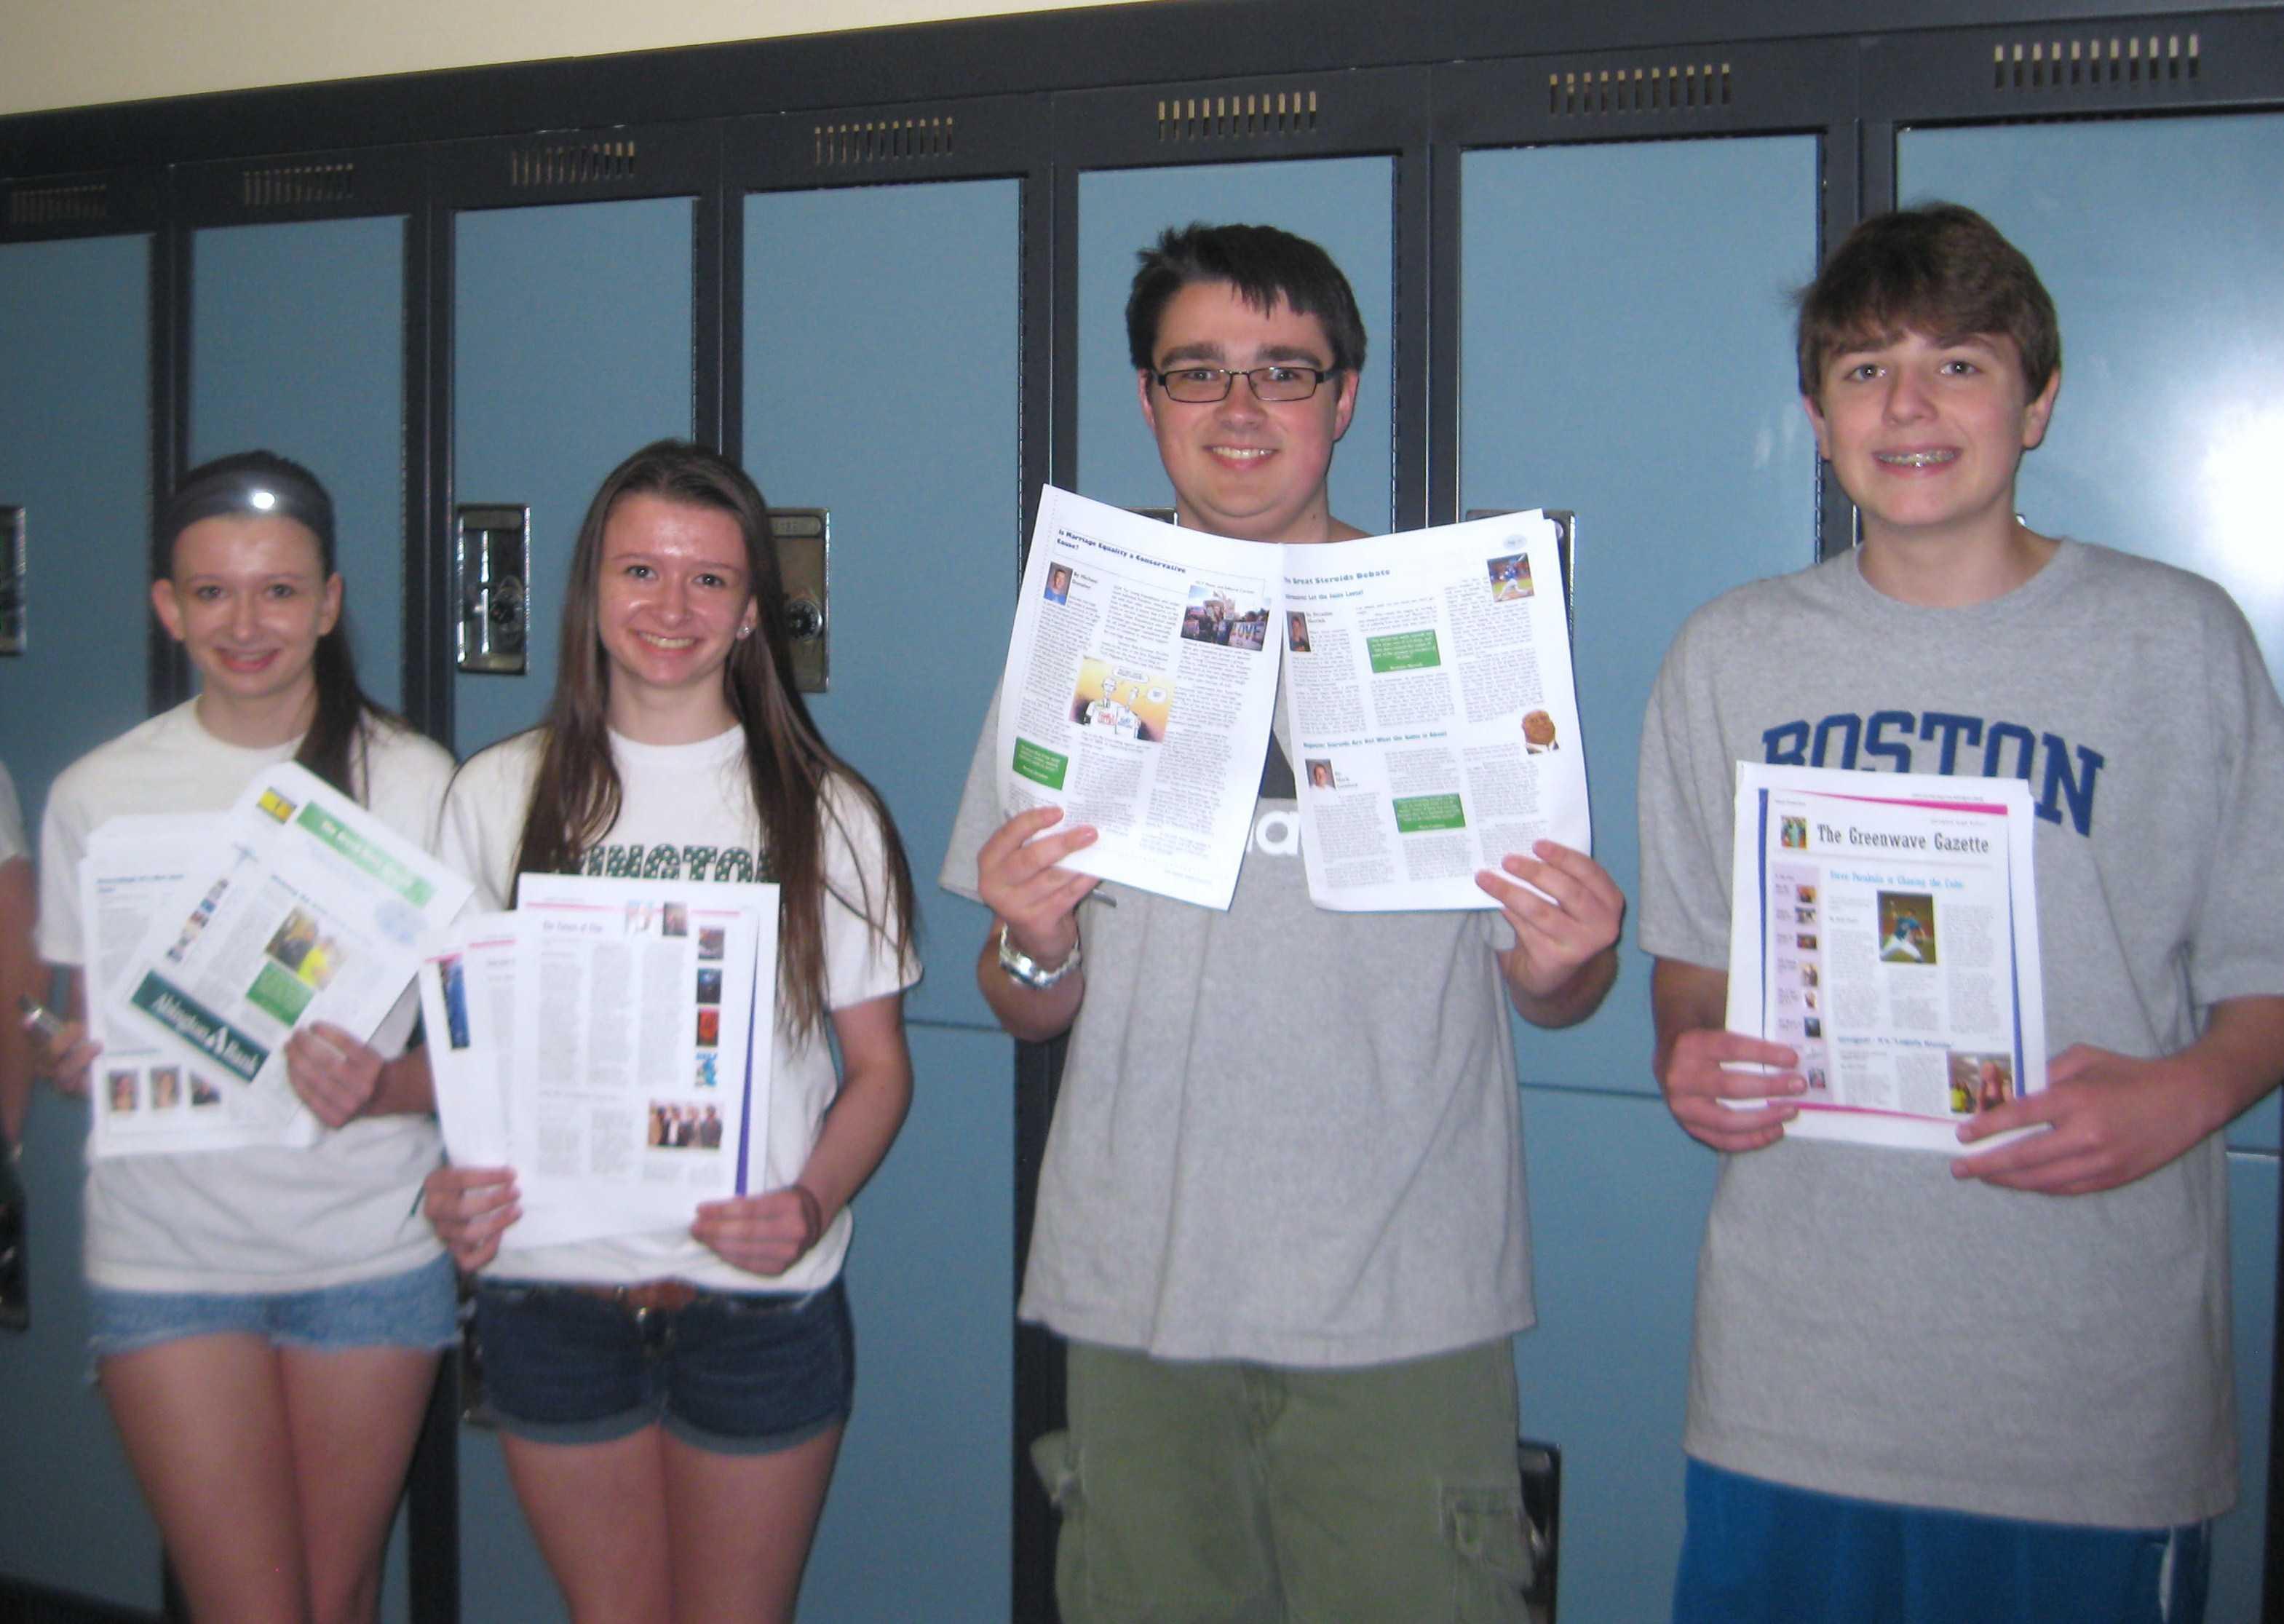 Members of the 2013-2014 Green Wave Gazette staff hold copies of the print newspaper: Caroline Bradbury (L), Nicole Bradbury, Ian MacLeod, and Jake Snyder (R).